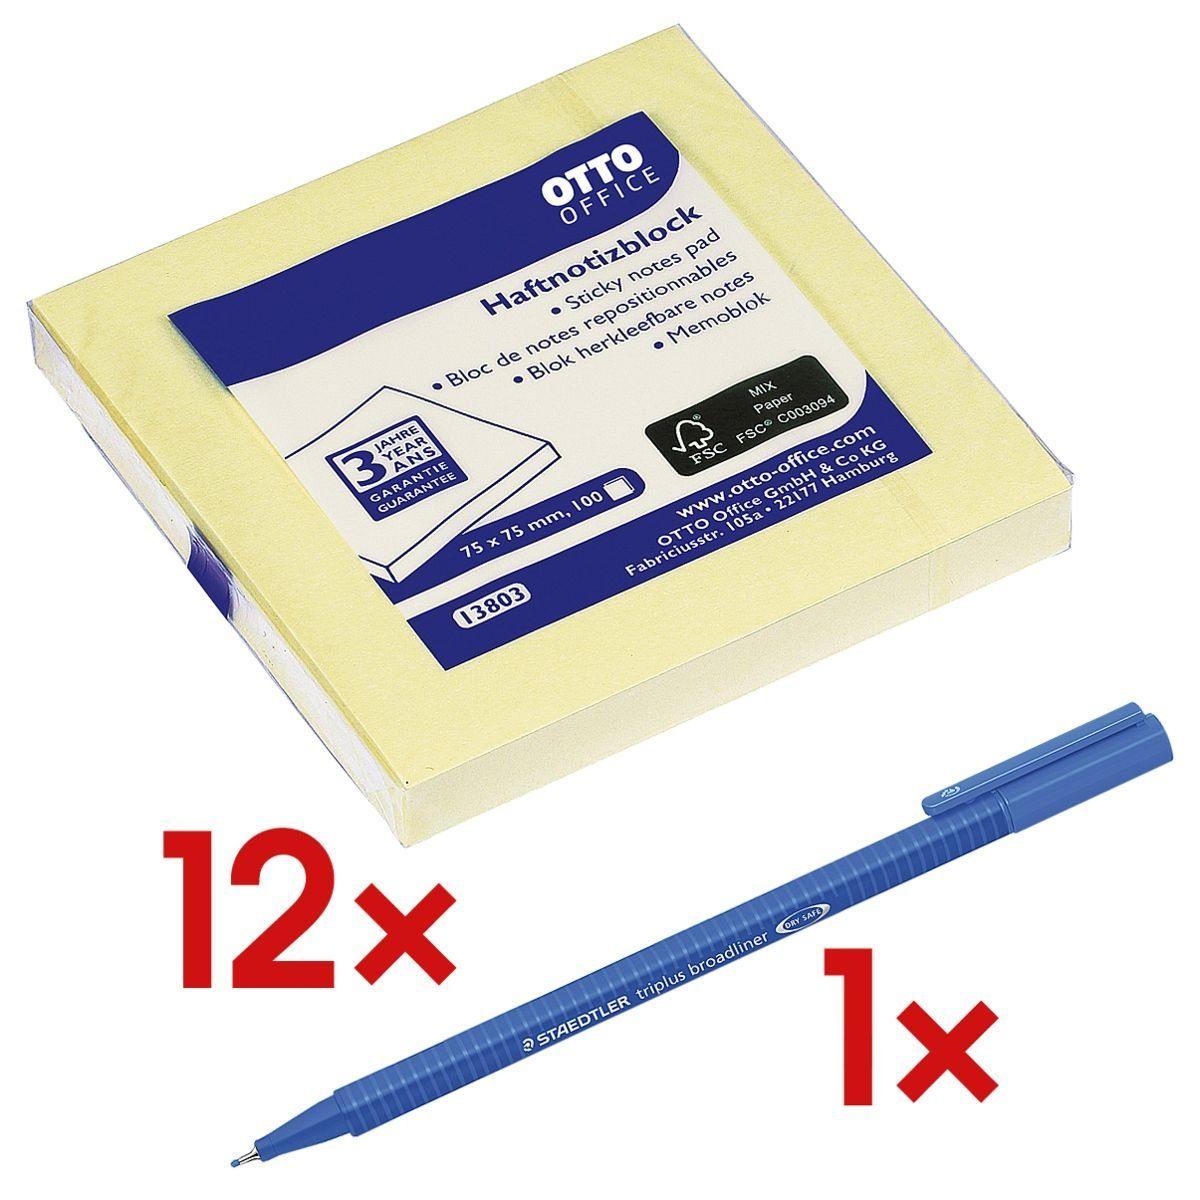 OTTOOFFICE STANDARD Haftnotizblock 7,5 x 7,5 cm, 12 Stück inkl. 1x Broadliner »triplus«, (1 Set)